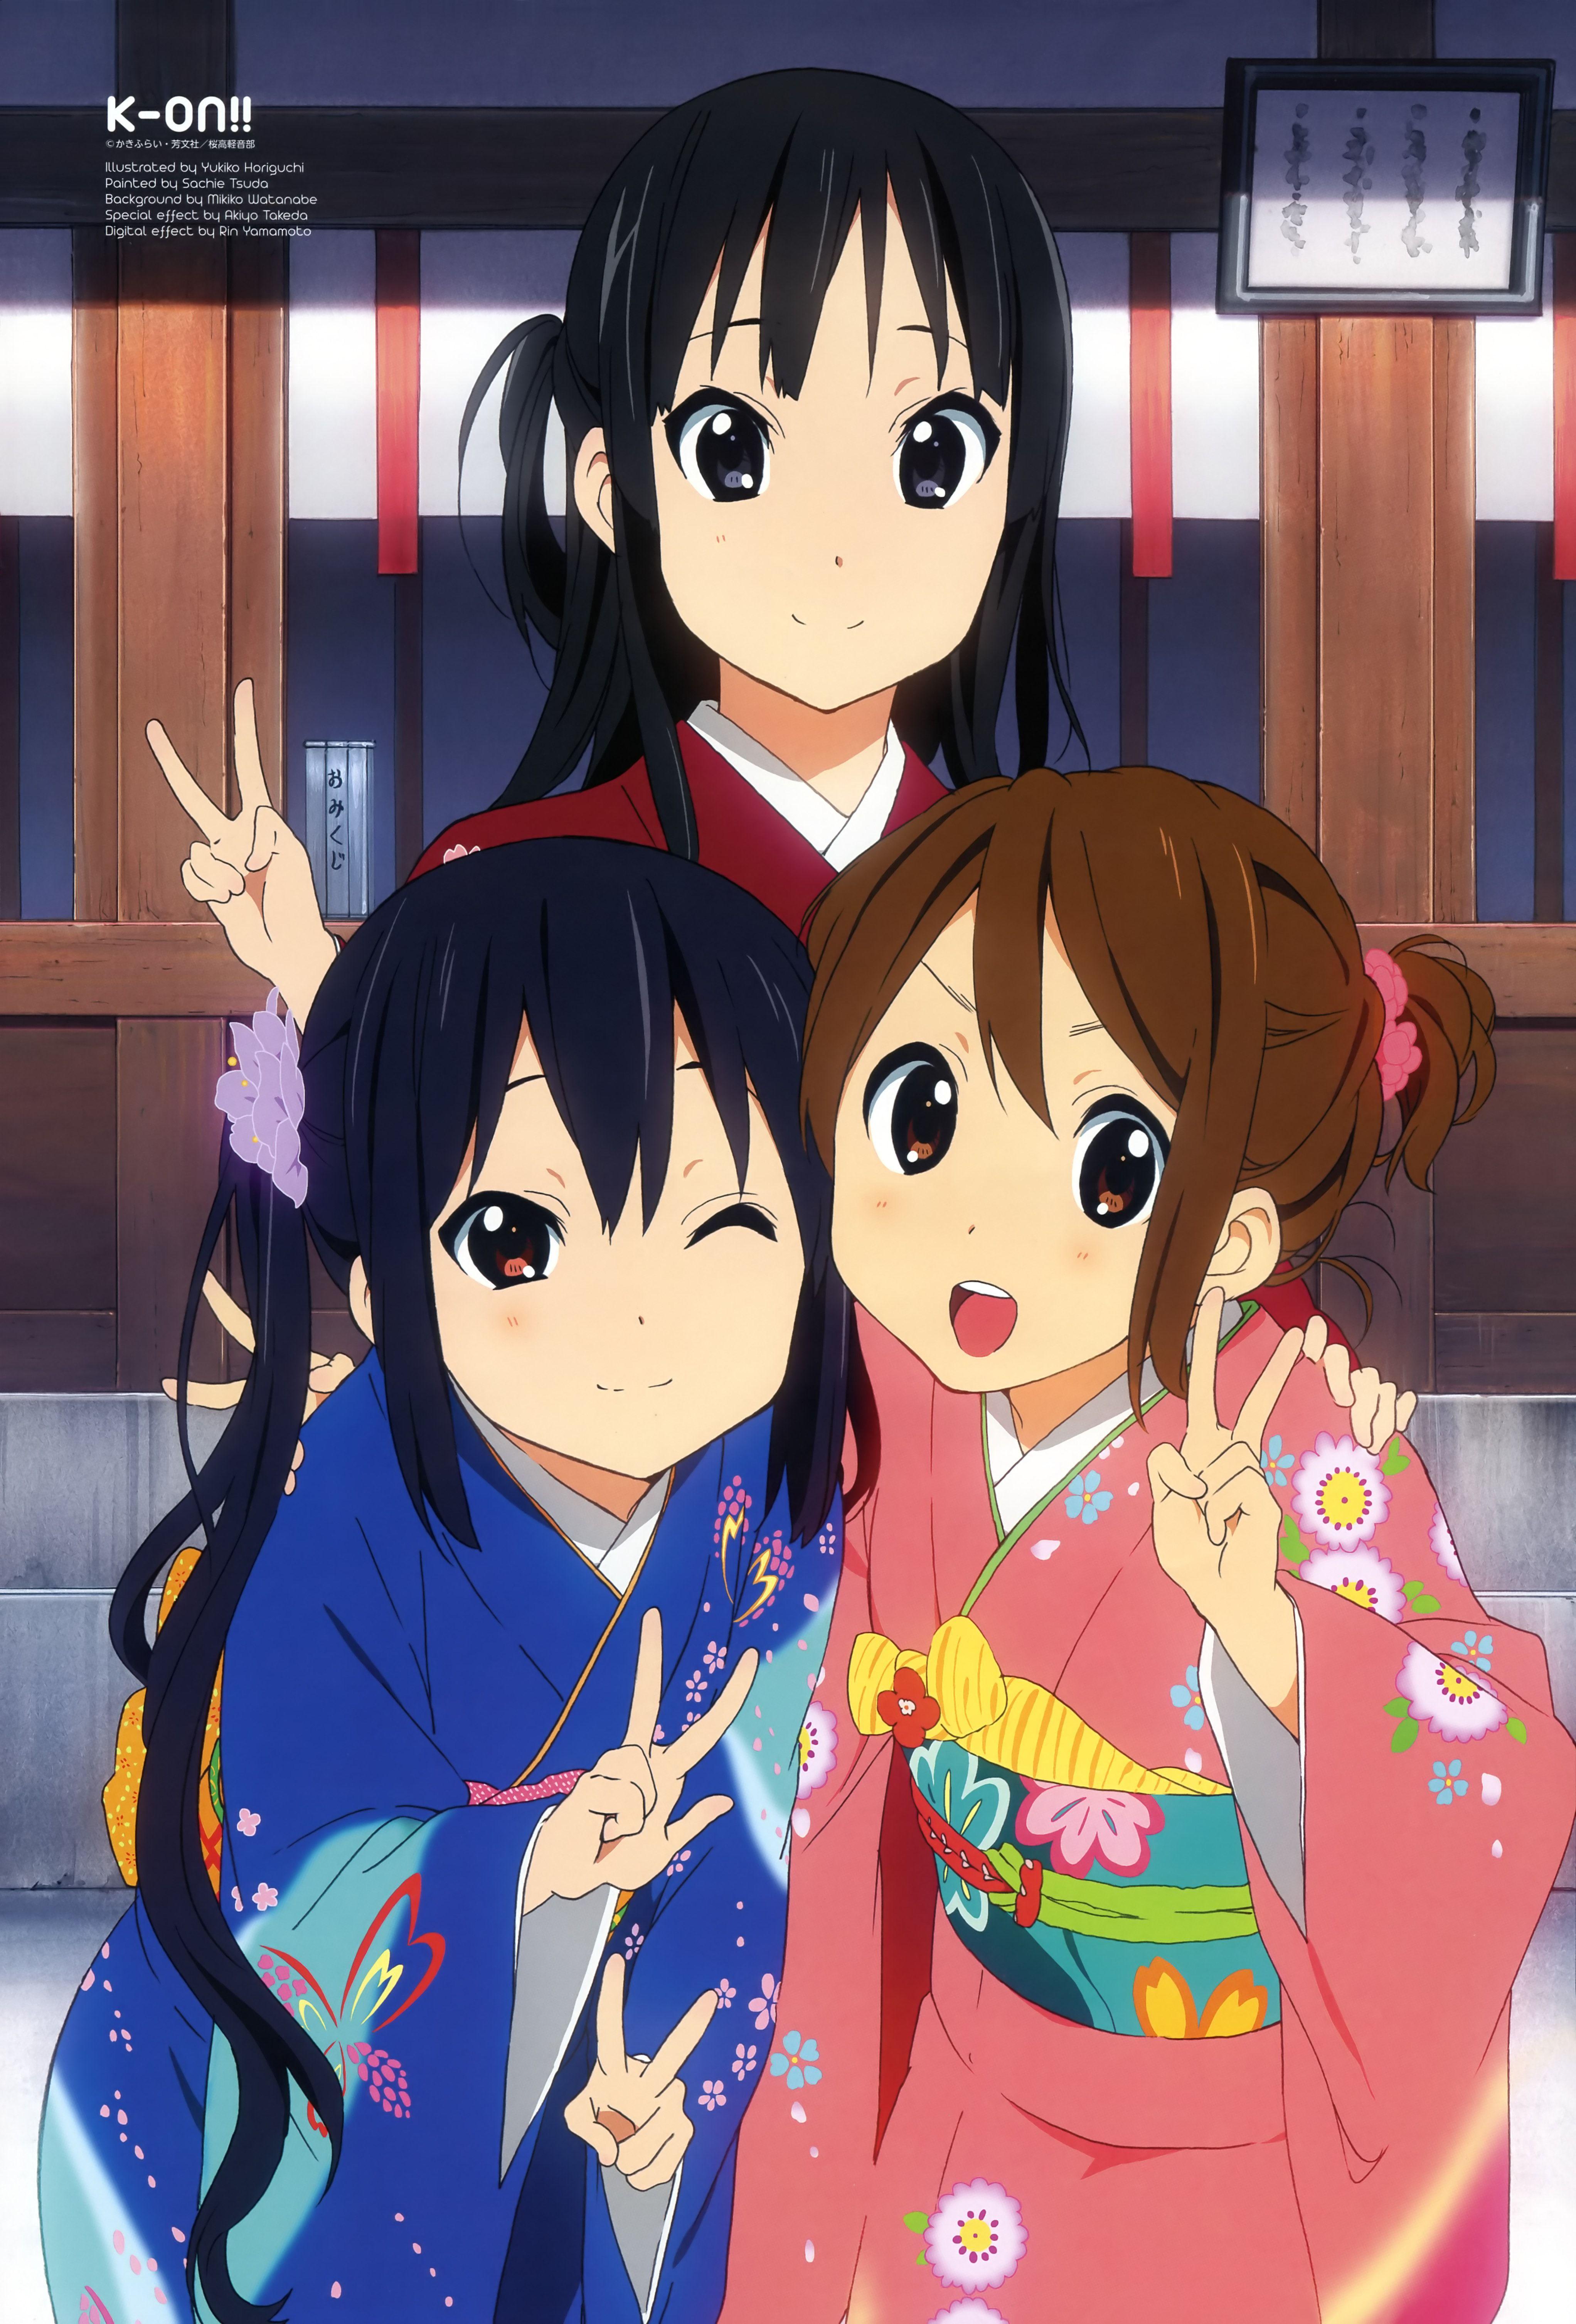 Pin By Lucy On Anime Anime Kawaii Anime Anime Movies